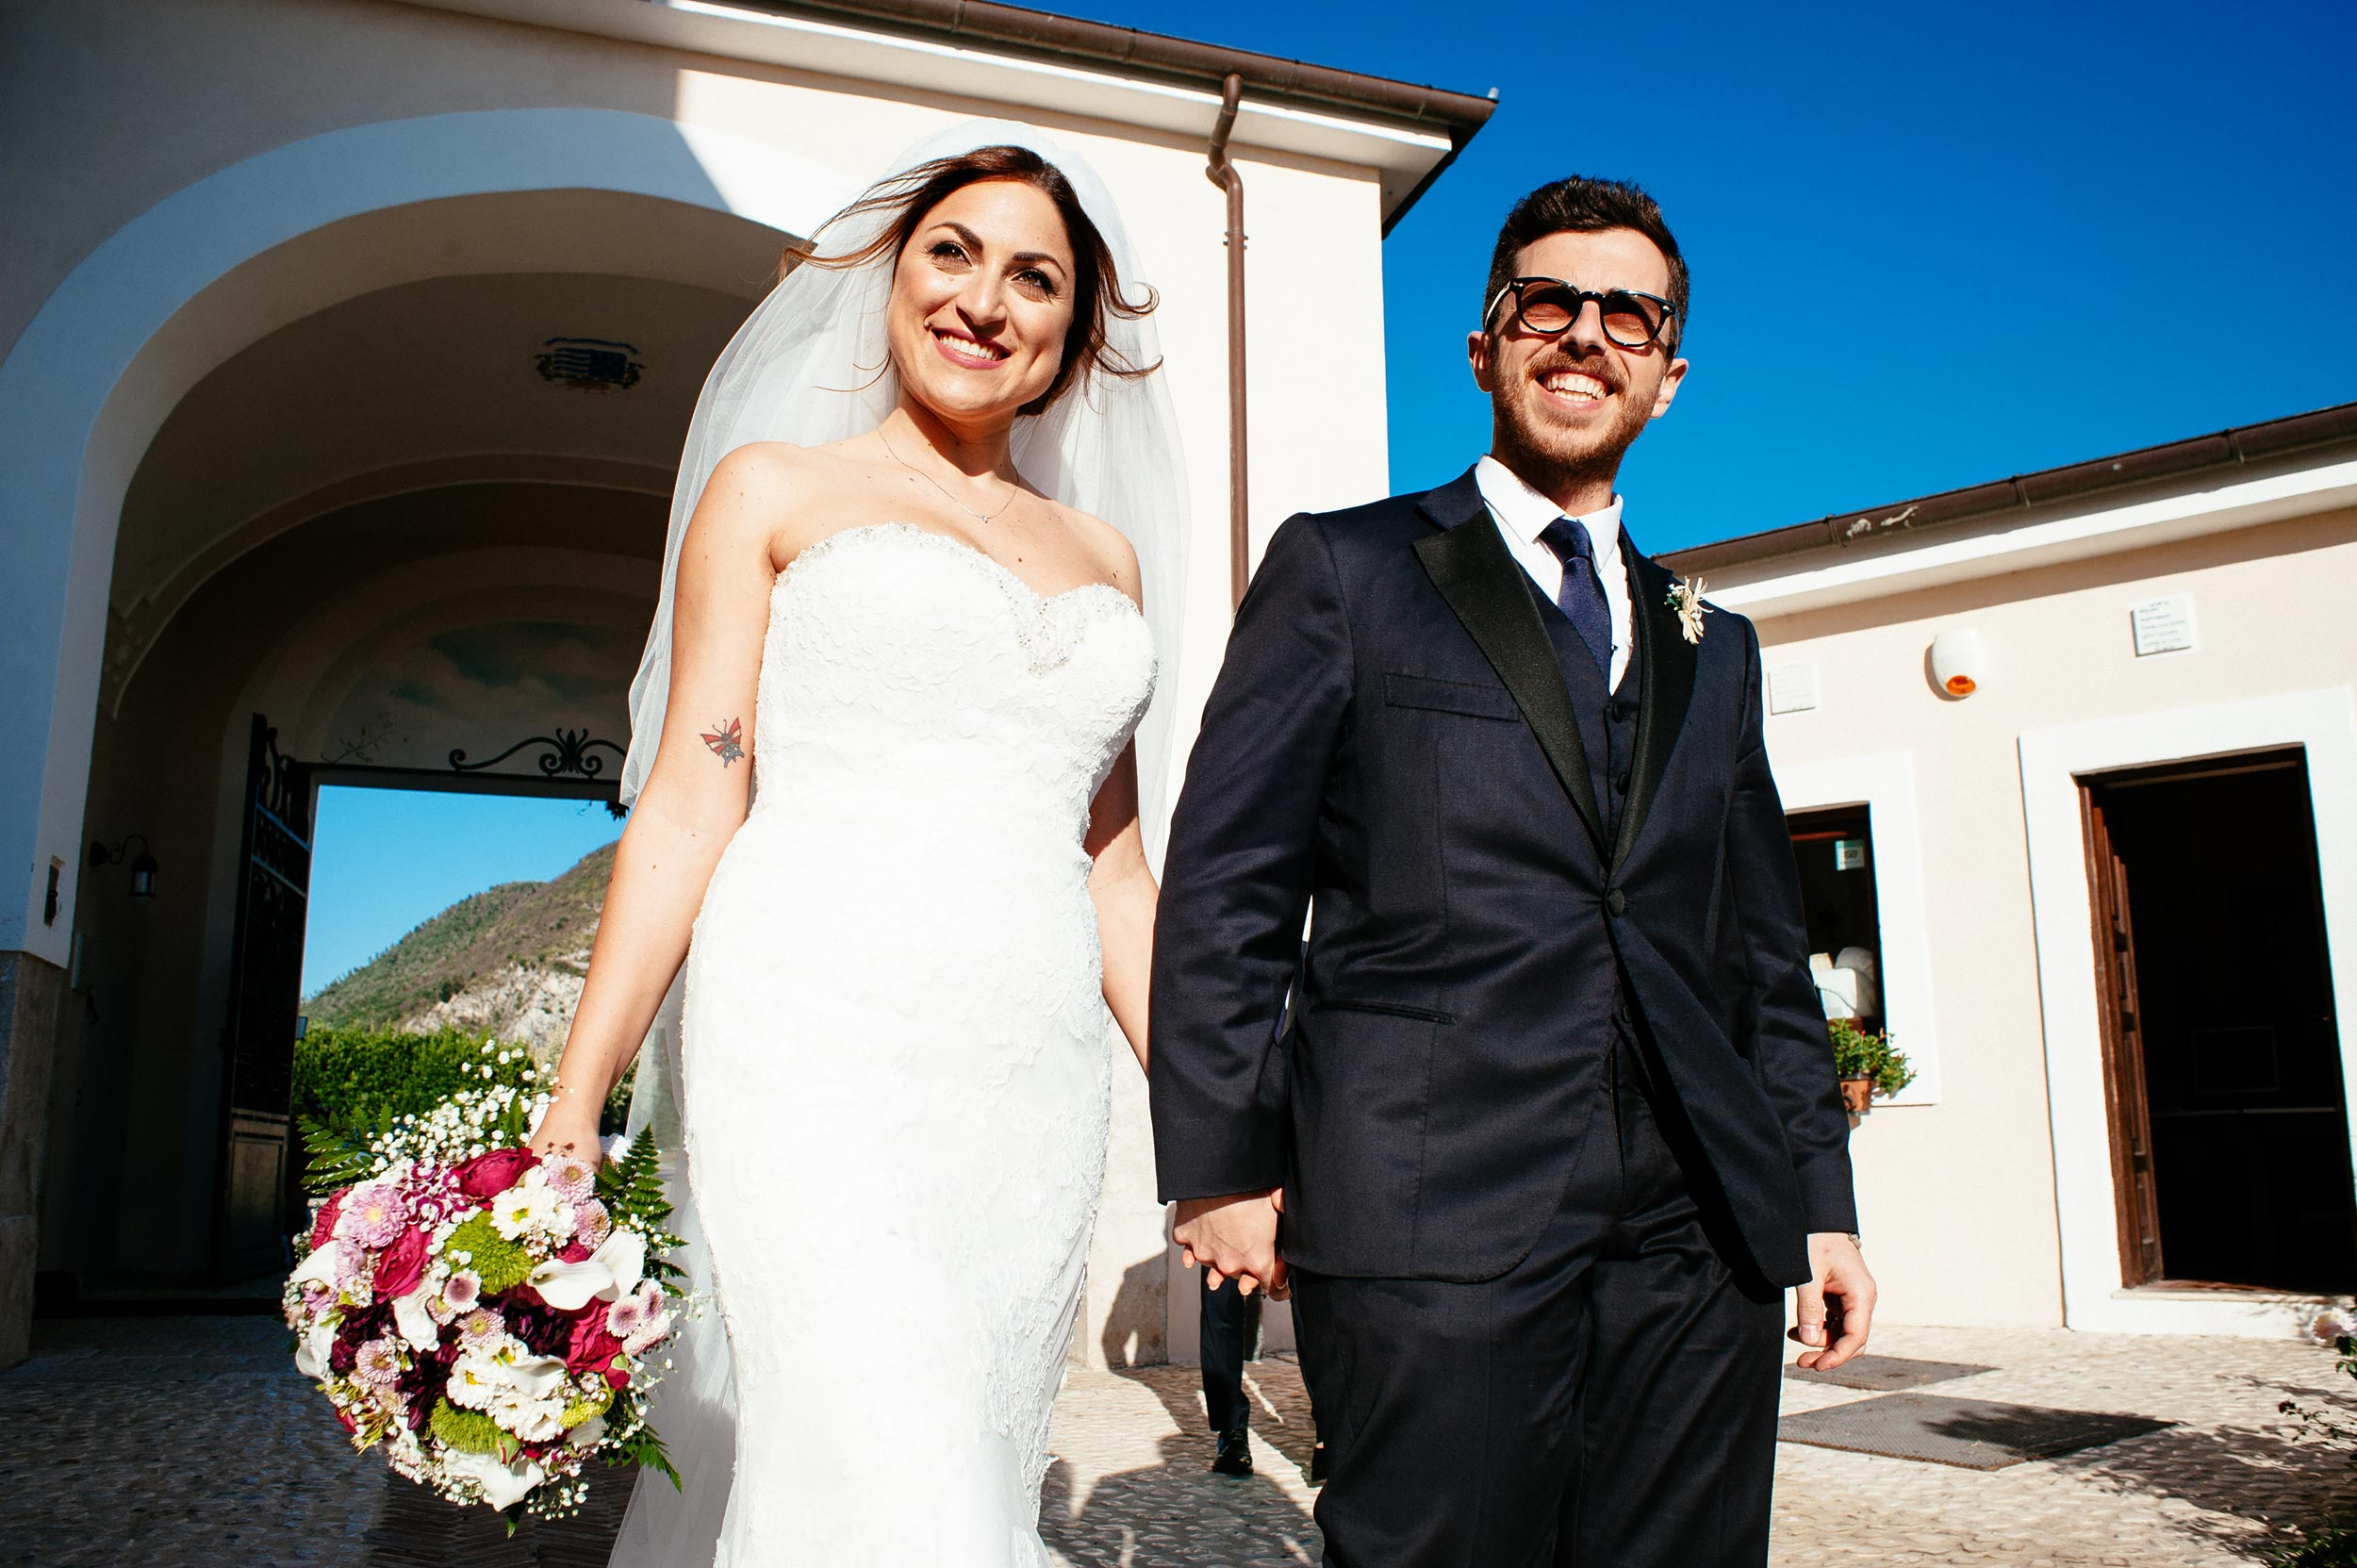 2016-Claudio-Teresa-Naples-Wedding-Photographer-Italy-Alessandro-Avenali-62.jpg